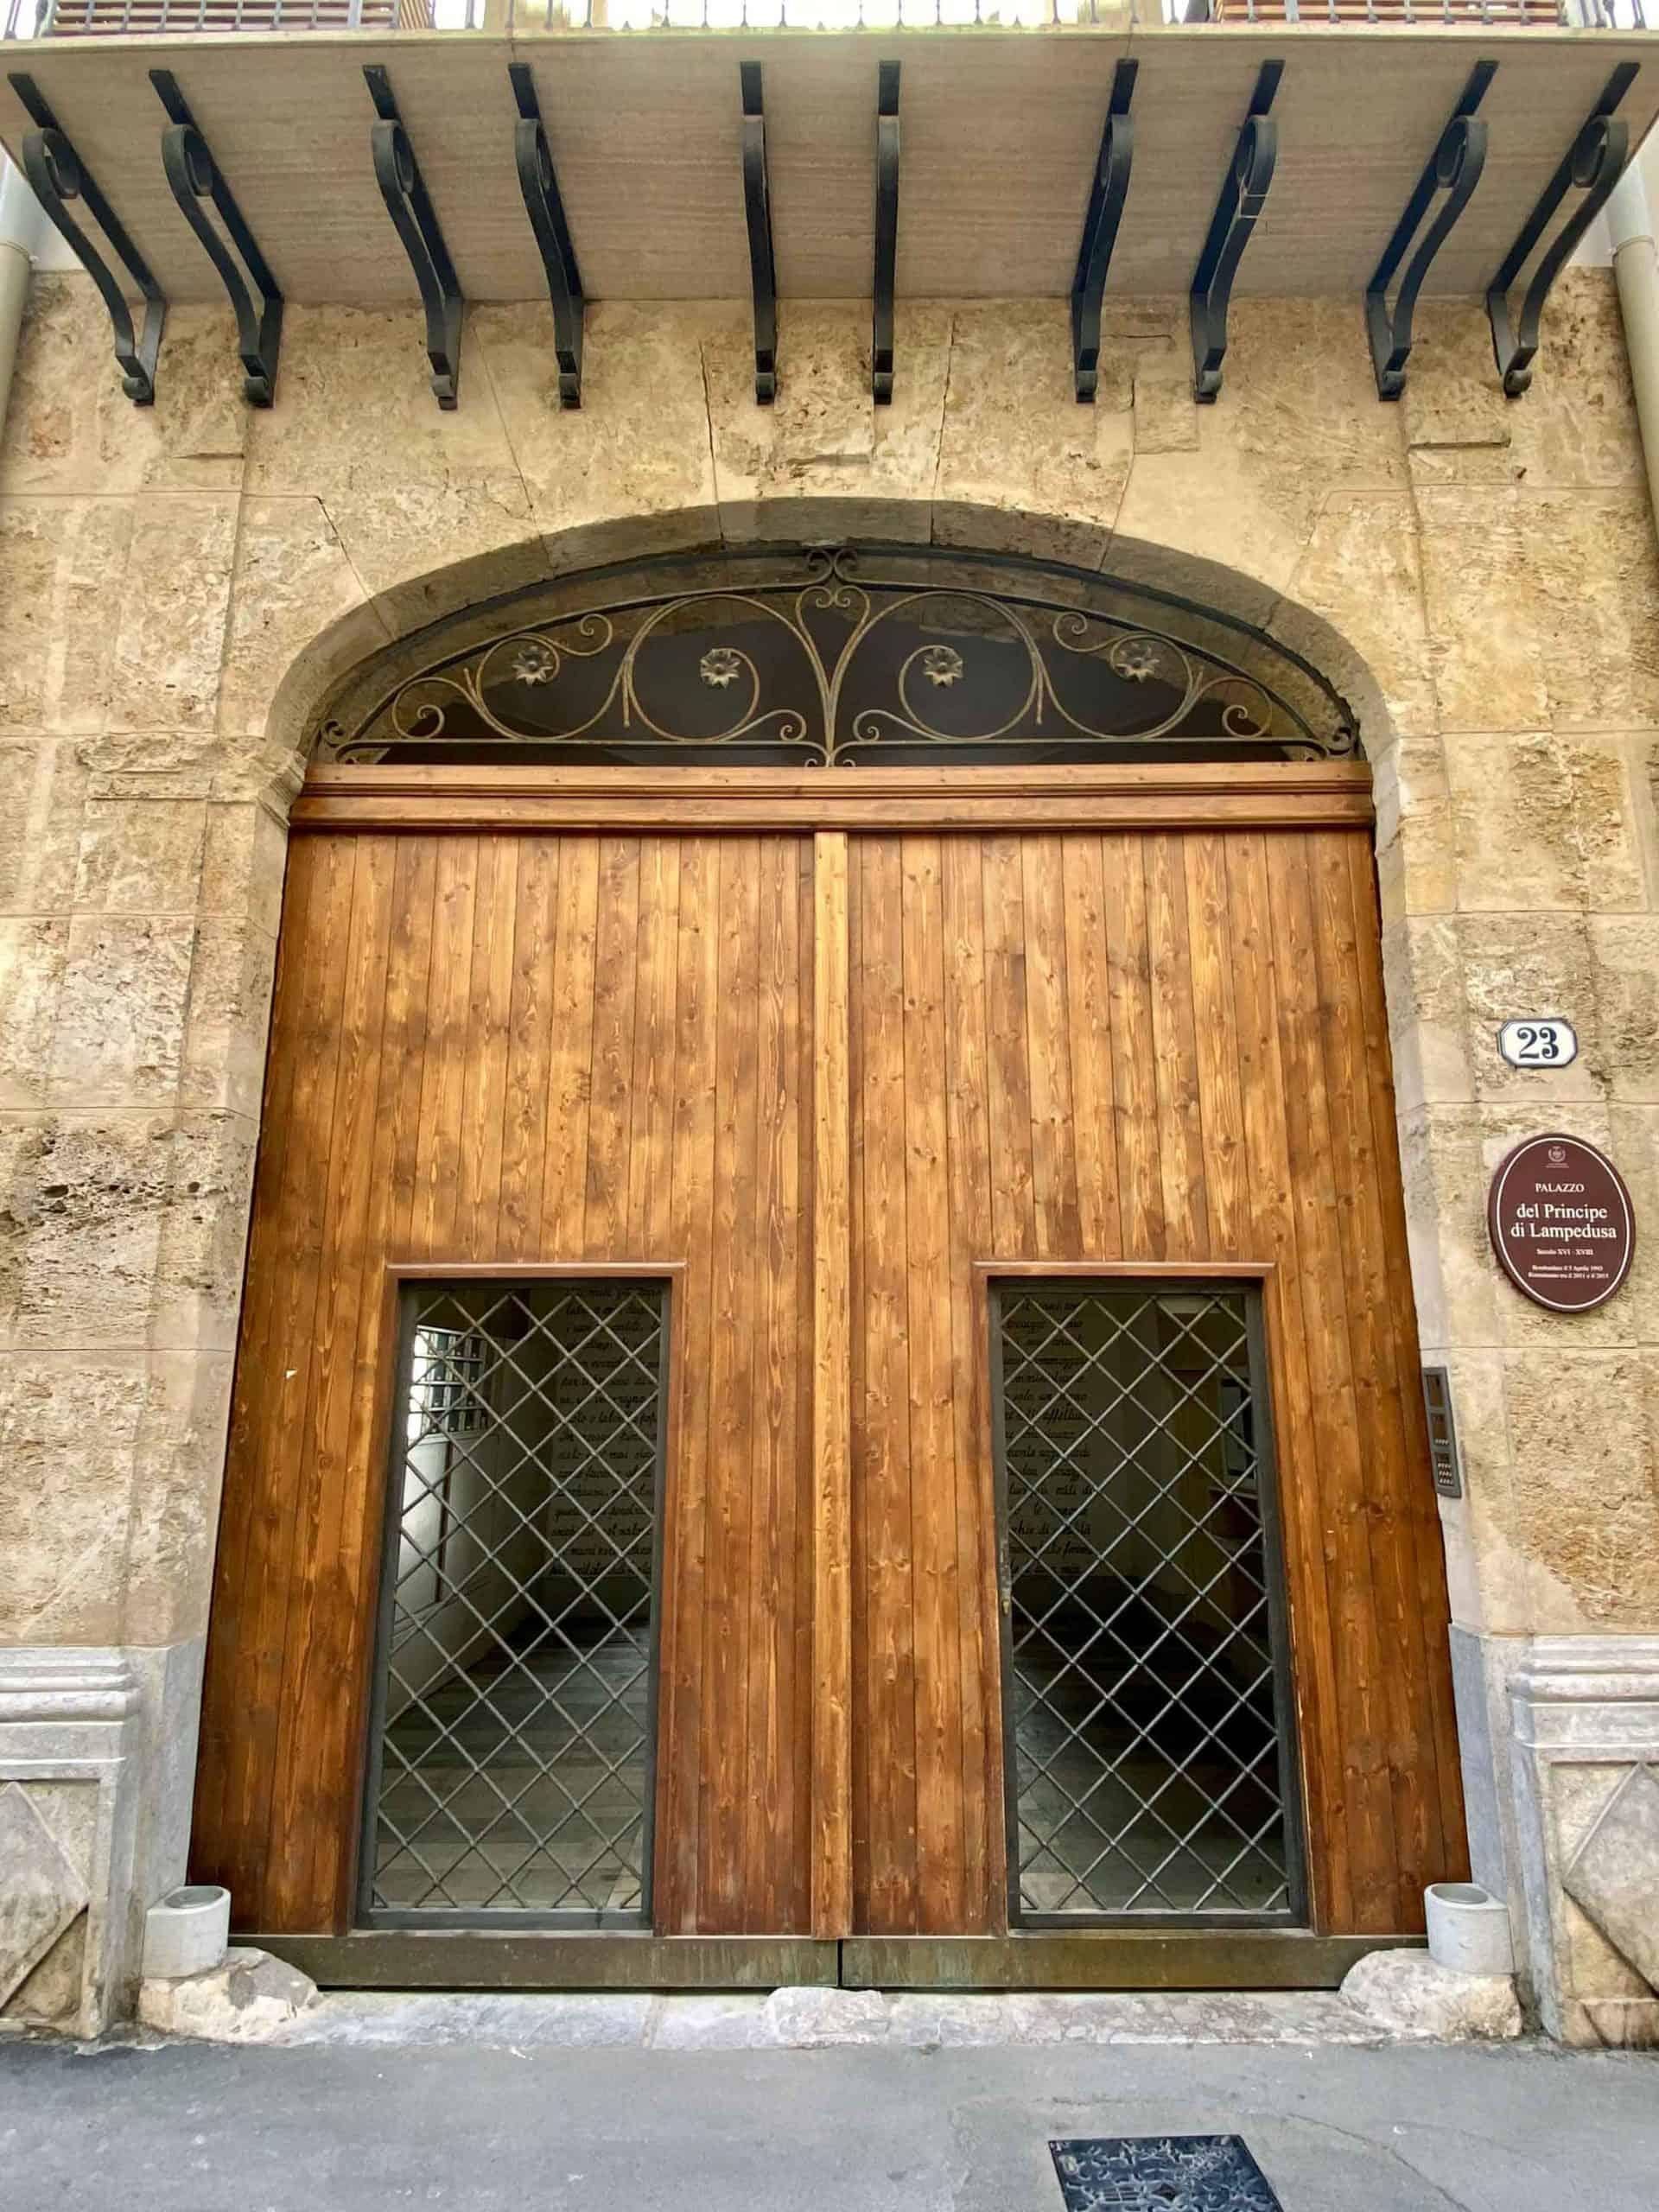 Portone Palazzo Lampedusa